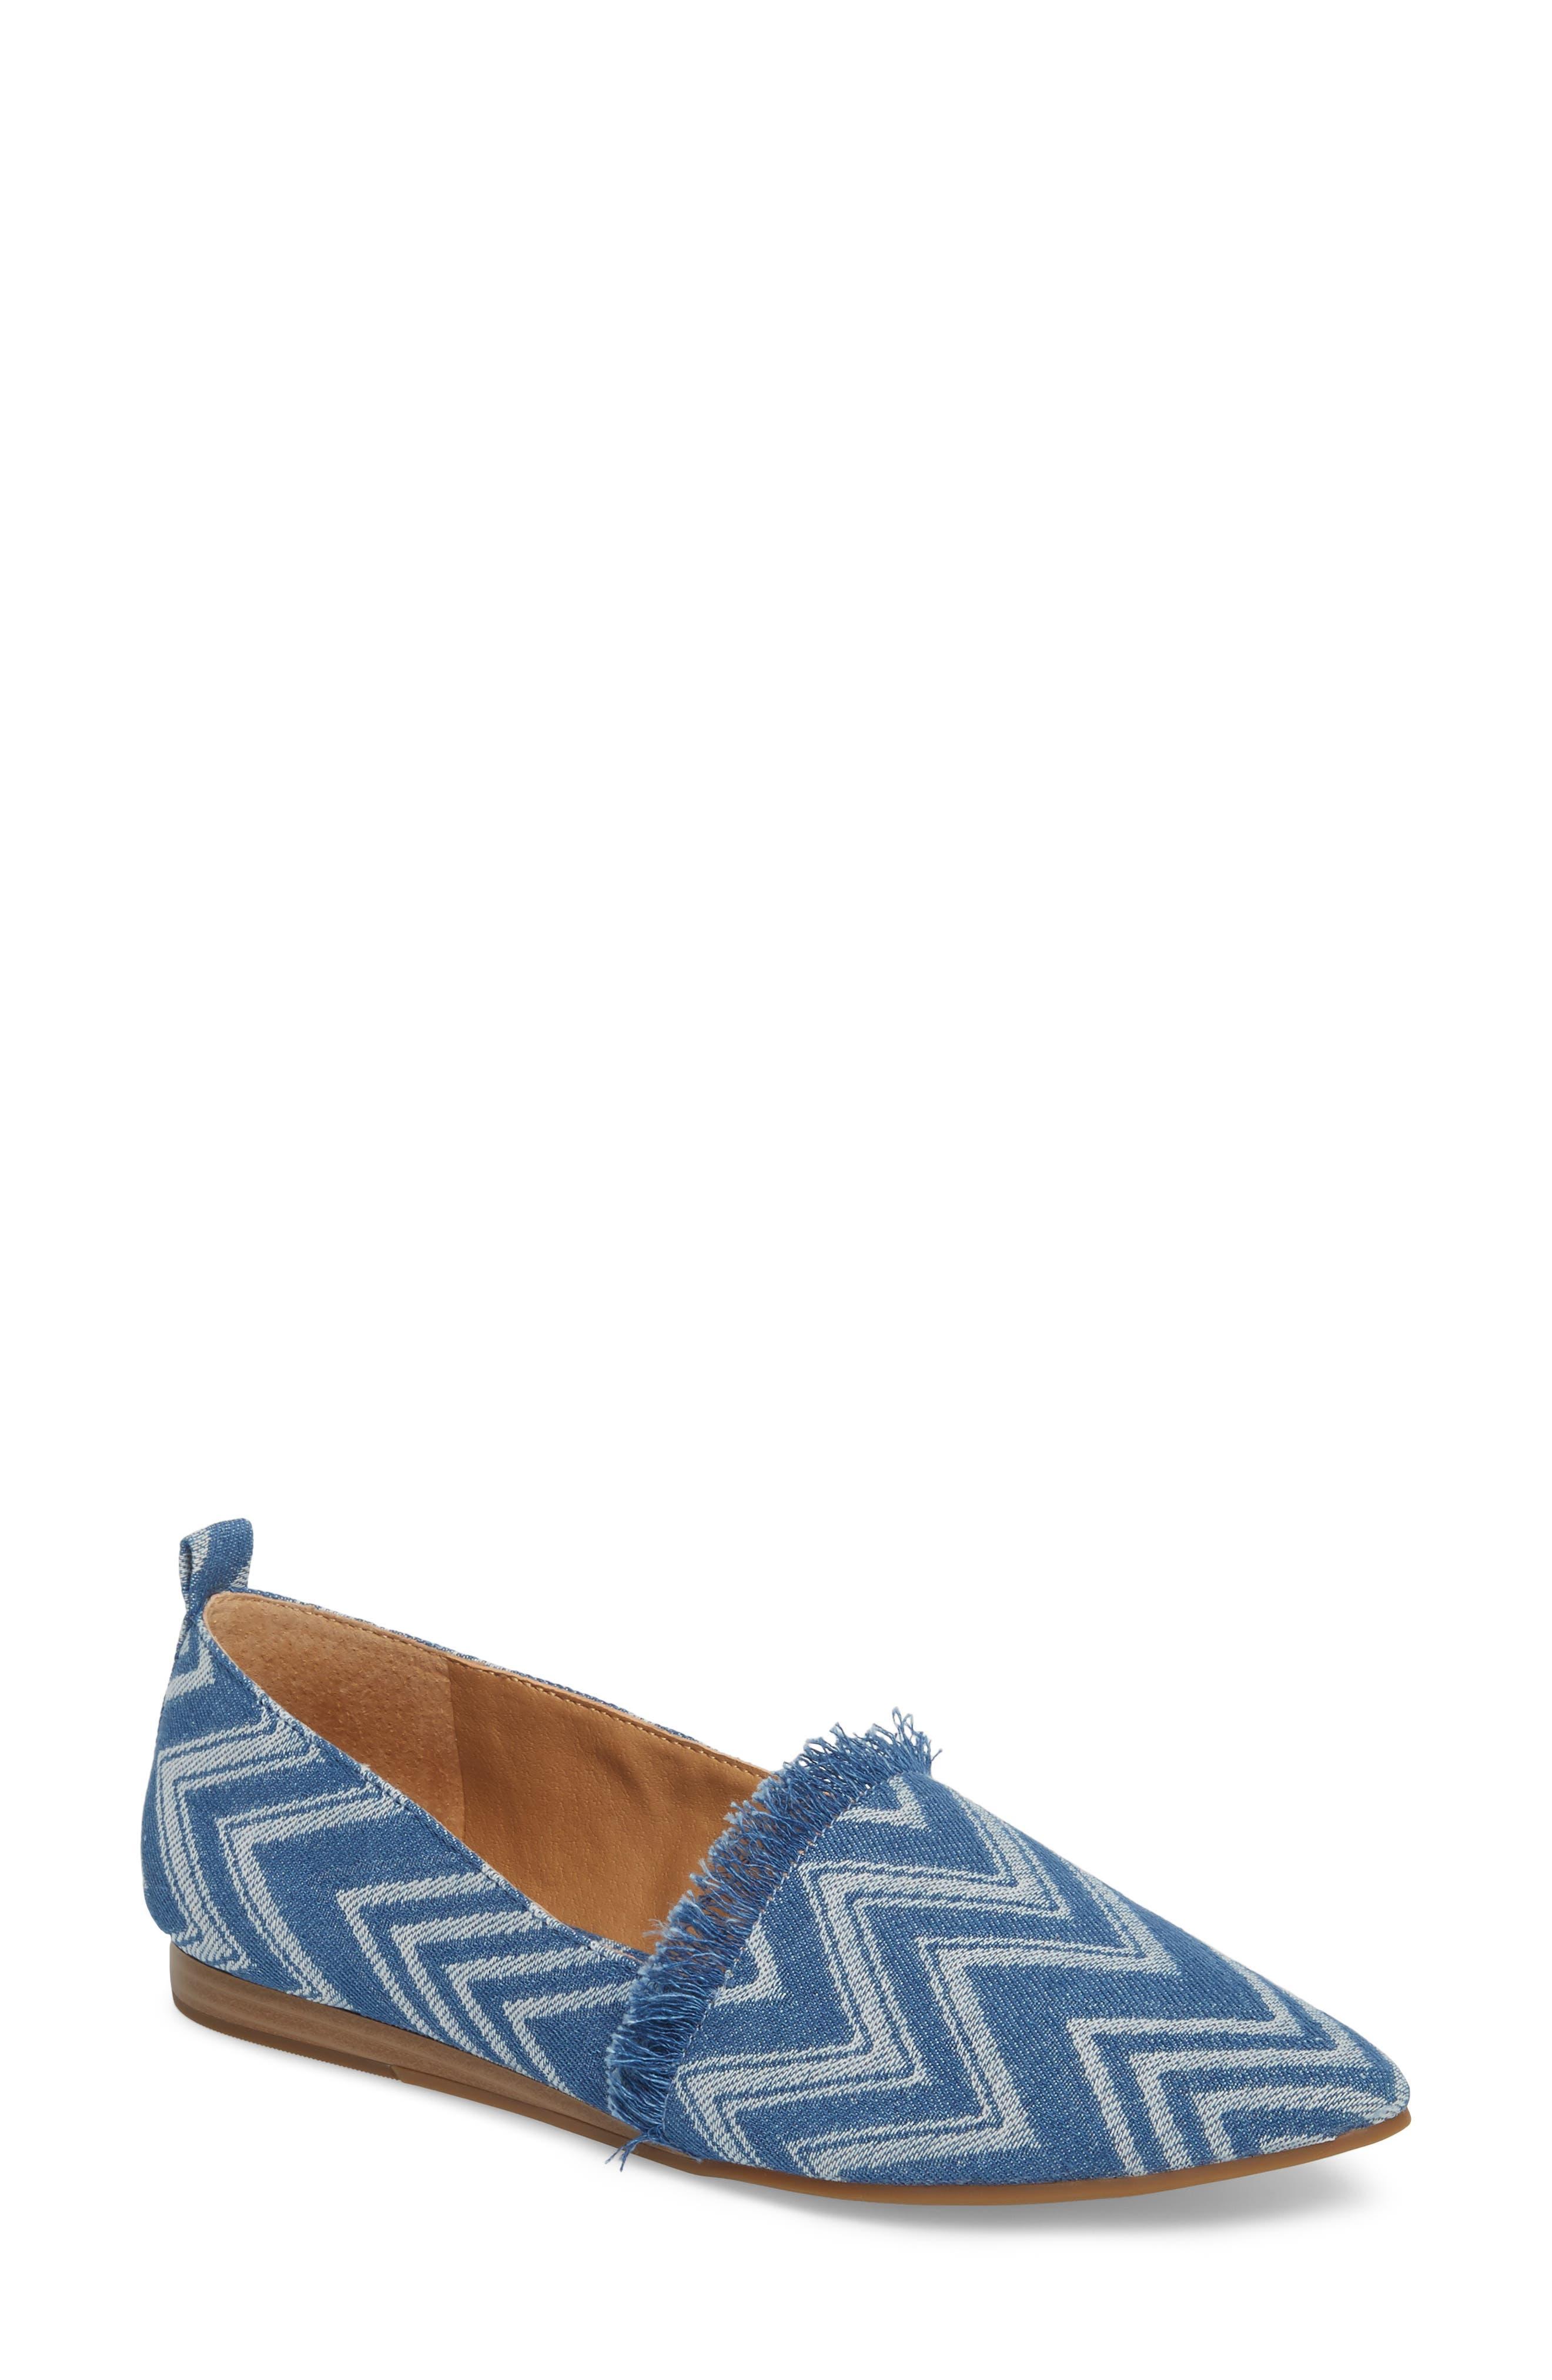 Main Image - Lucky Brand Beechmer Pointy Toe Flat (Women)